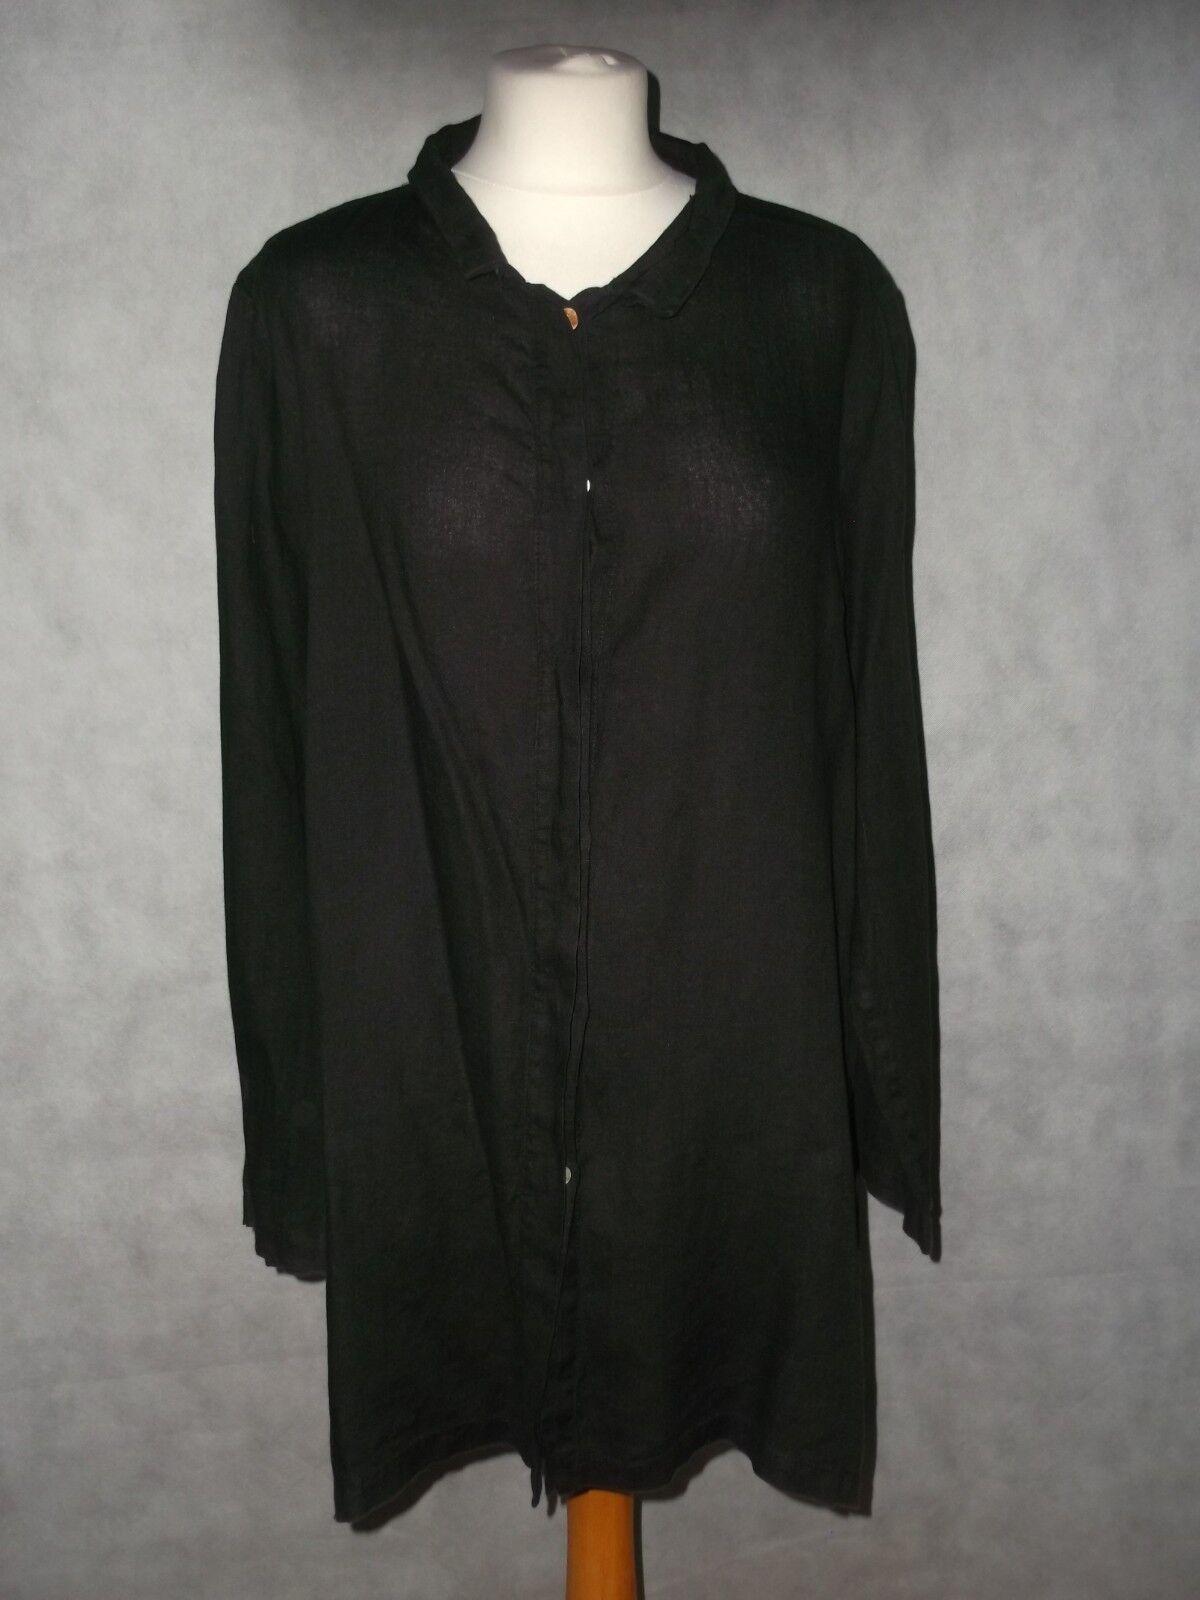 SARAH PACINI pure quality linen overGrößed shirt Größe 2